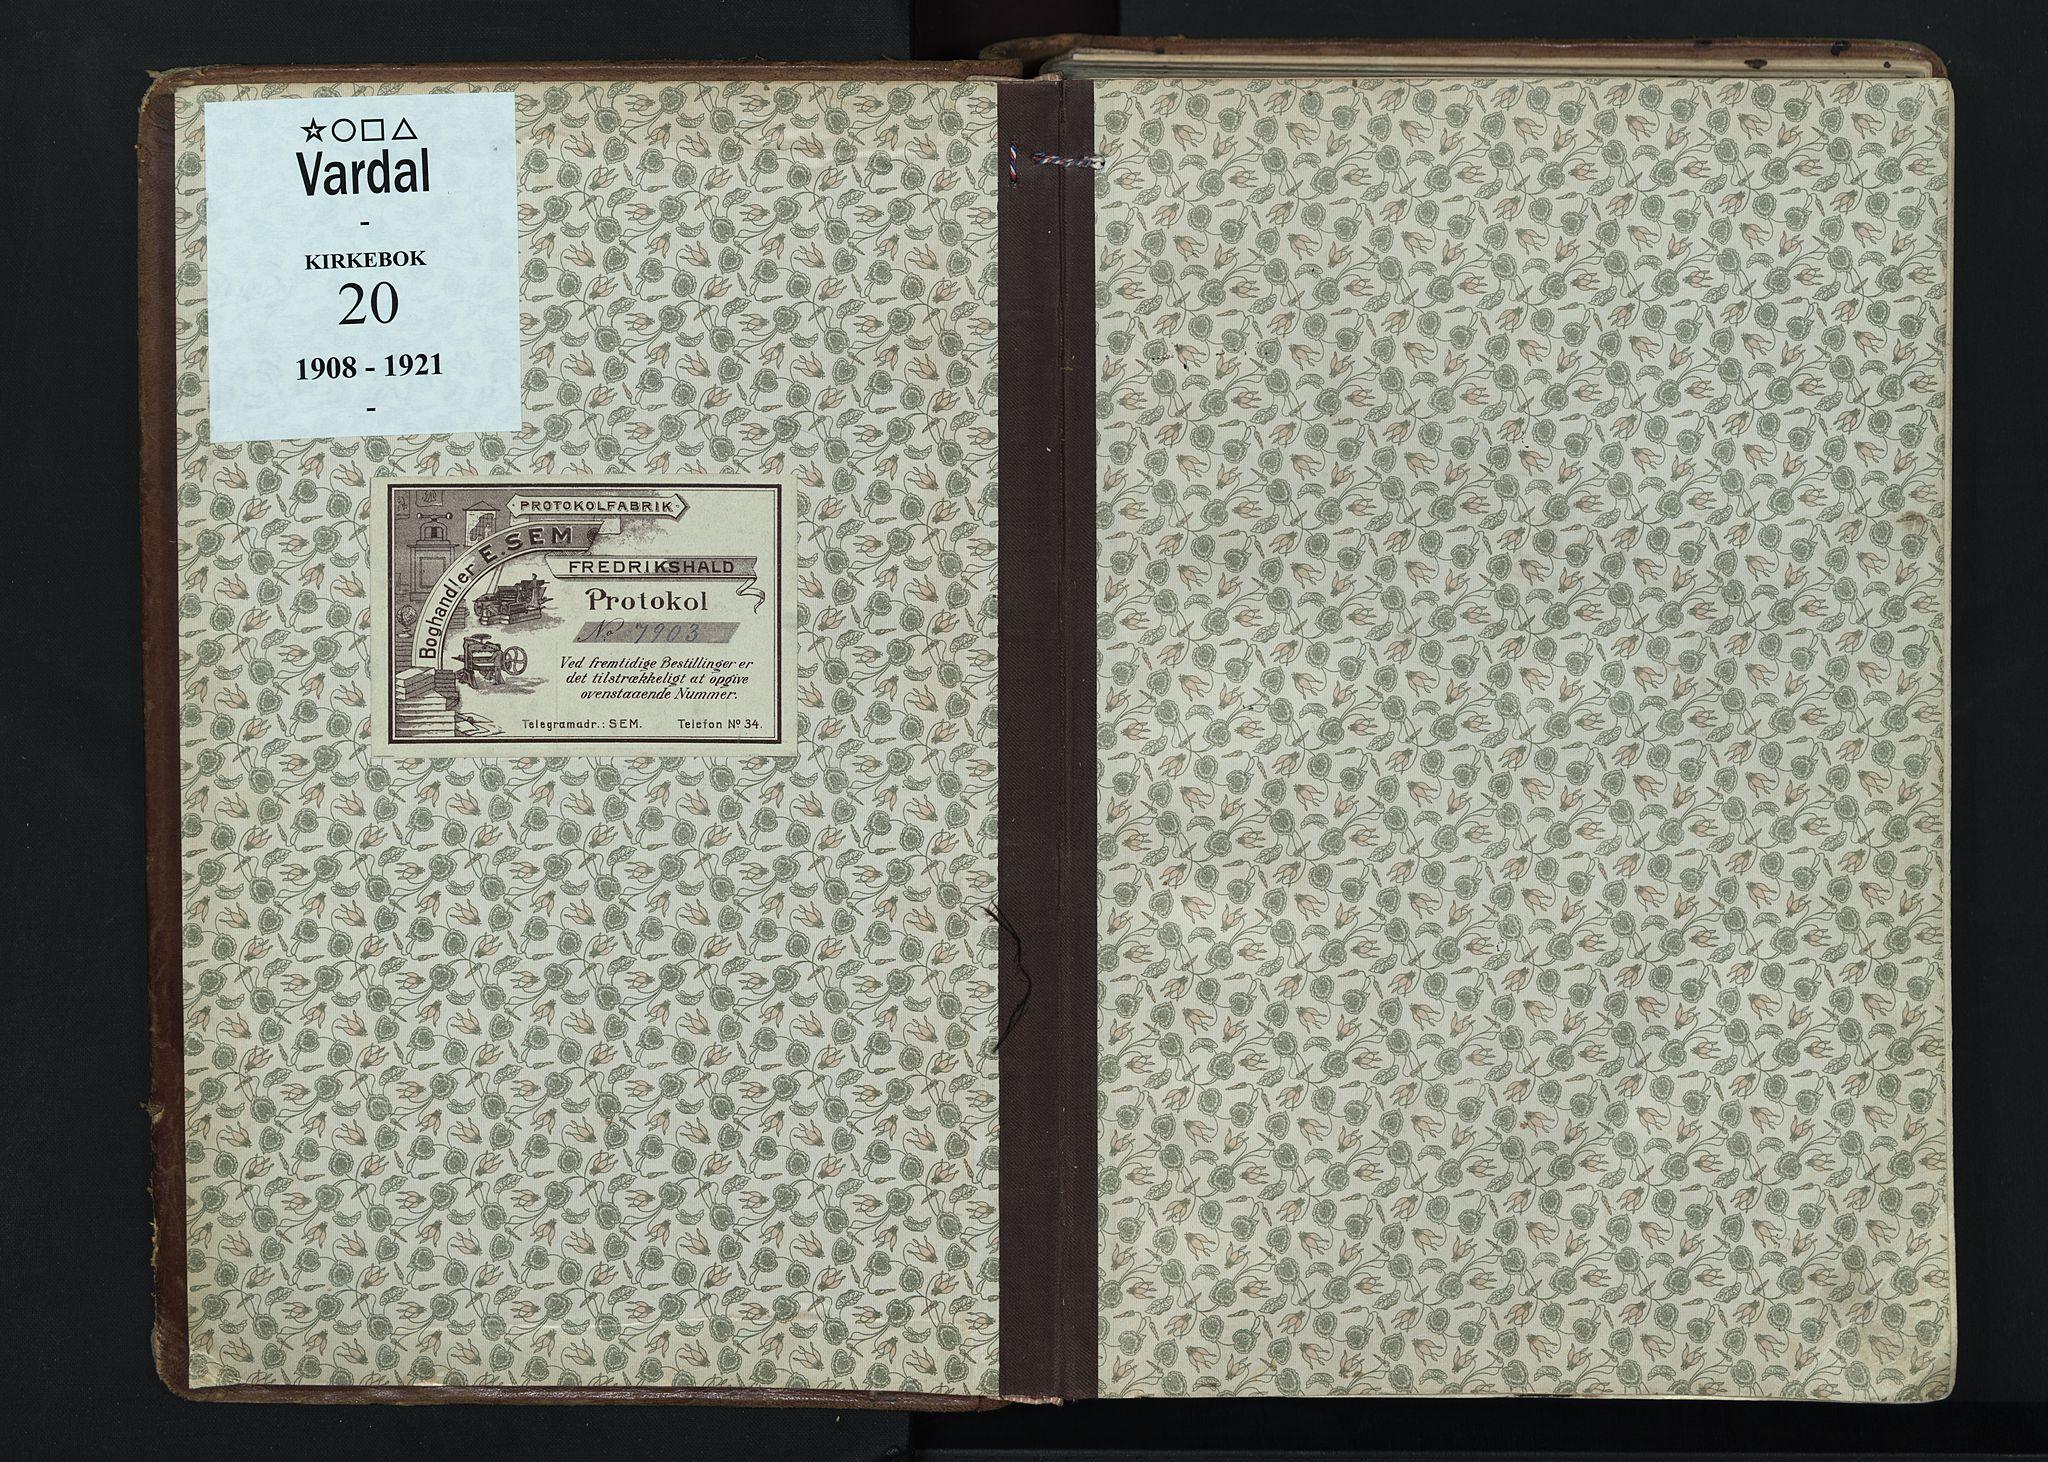 SAH, Vardal prestekontor, H/Ha/Haa/L0020: Ministerialbok nr. 20, 1907-1921